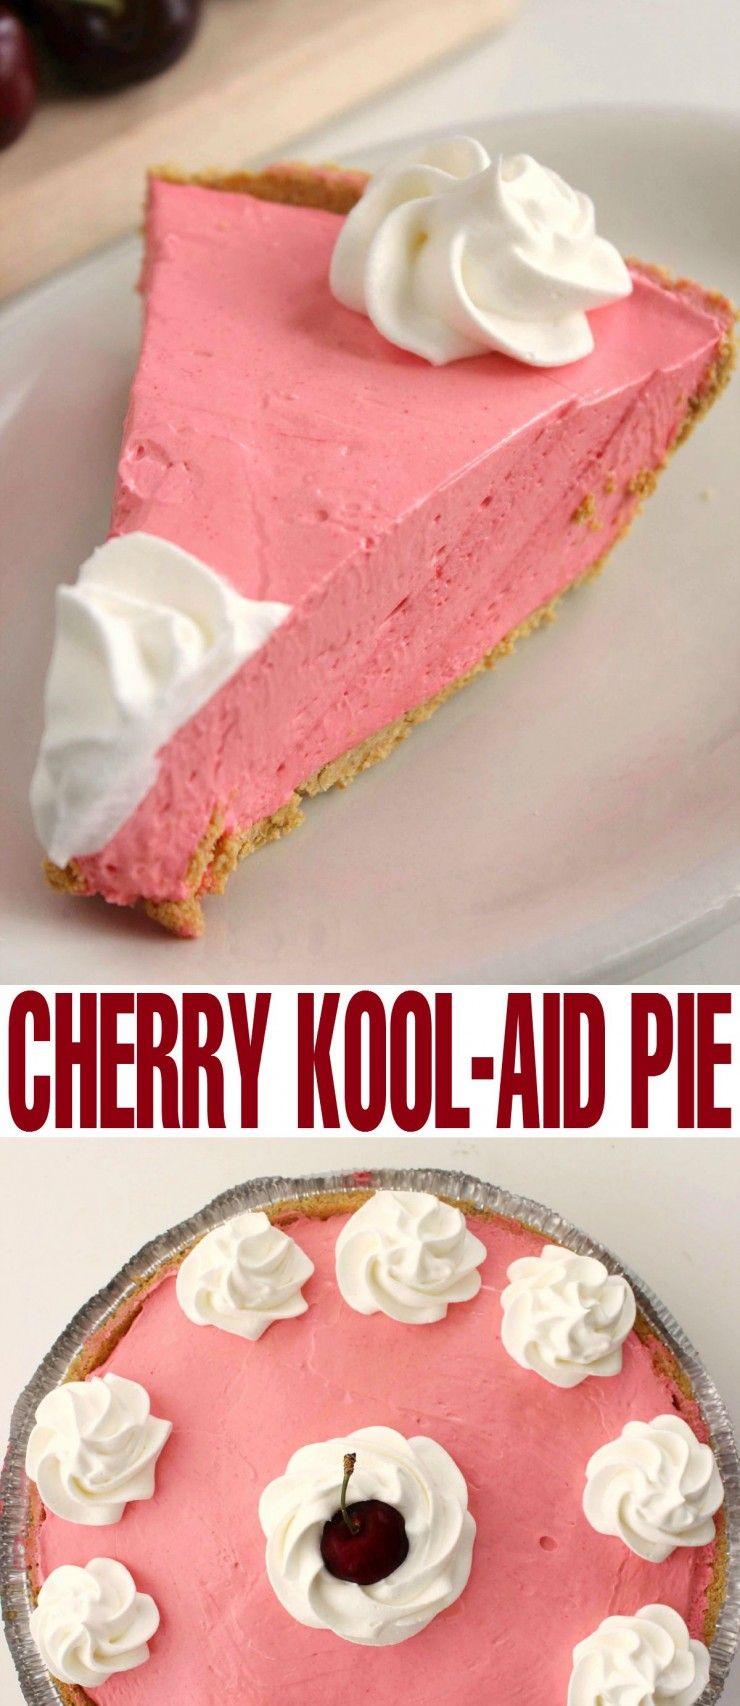 Cherry Kool Aid Pie Recipe Dessert Recipes Easy Desserts Kool Aid Pie Recipe